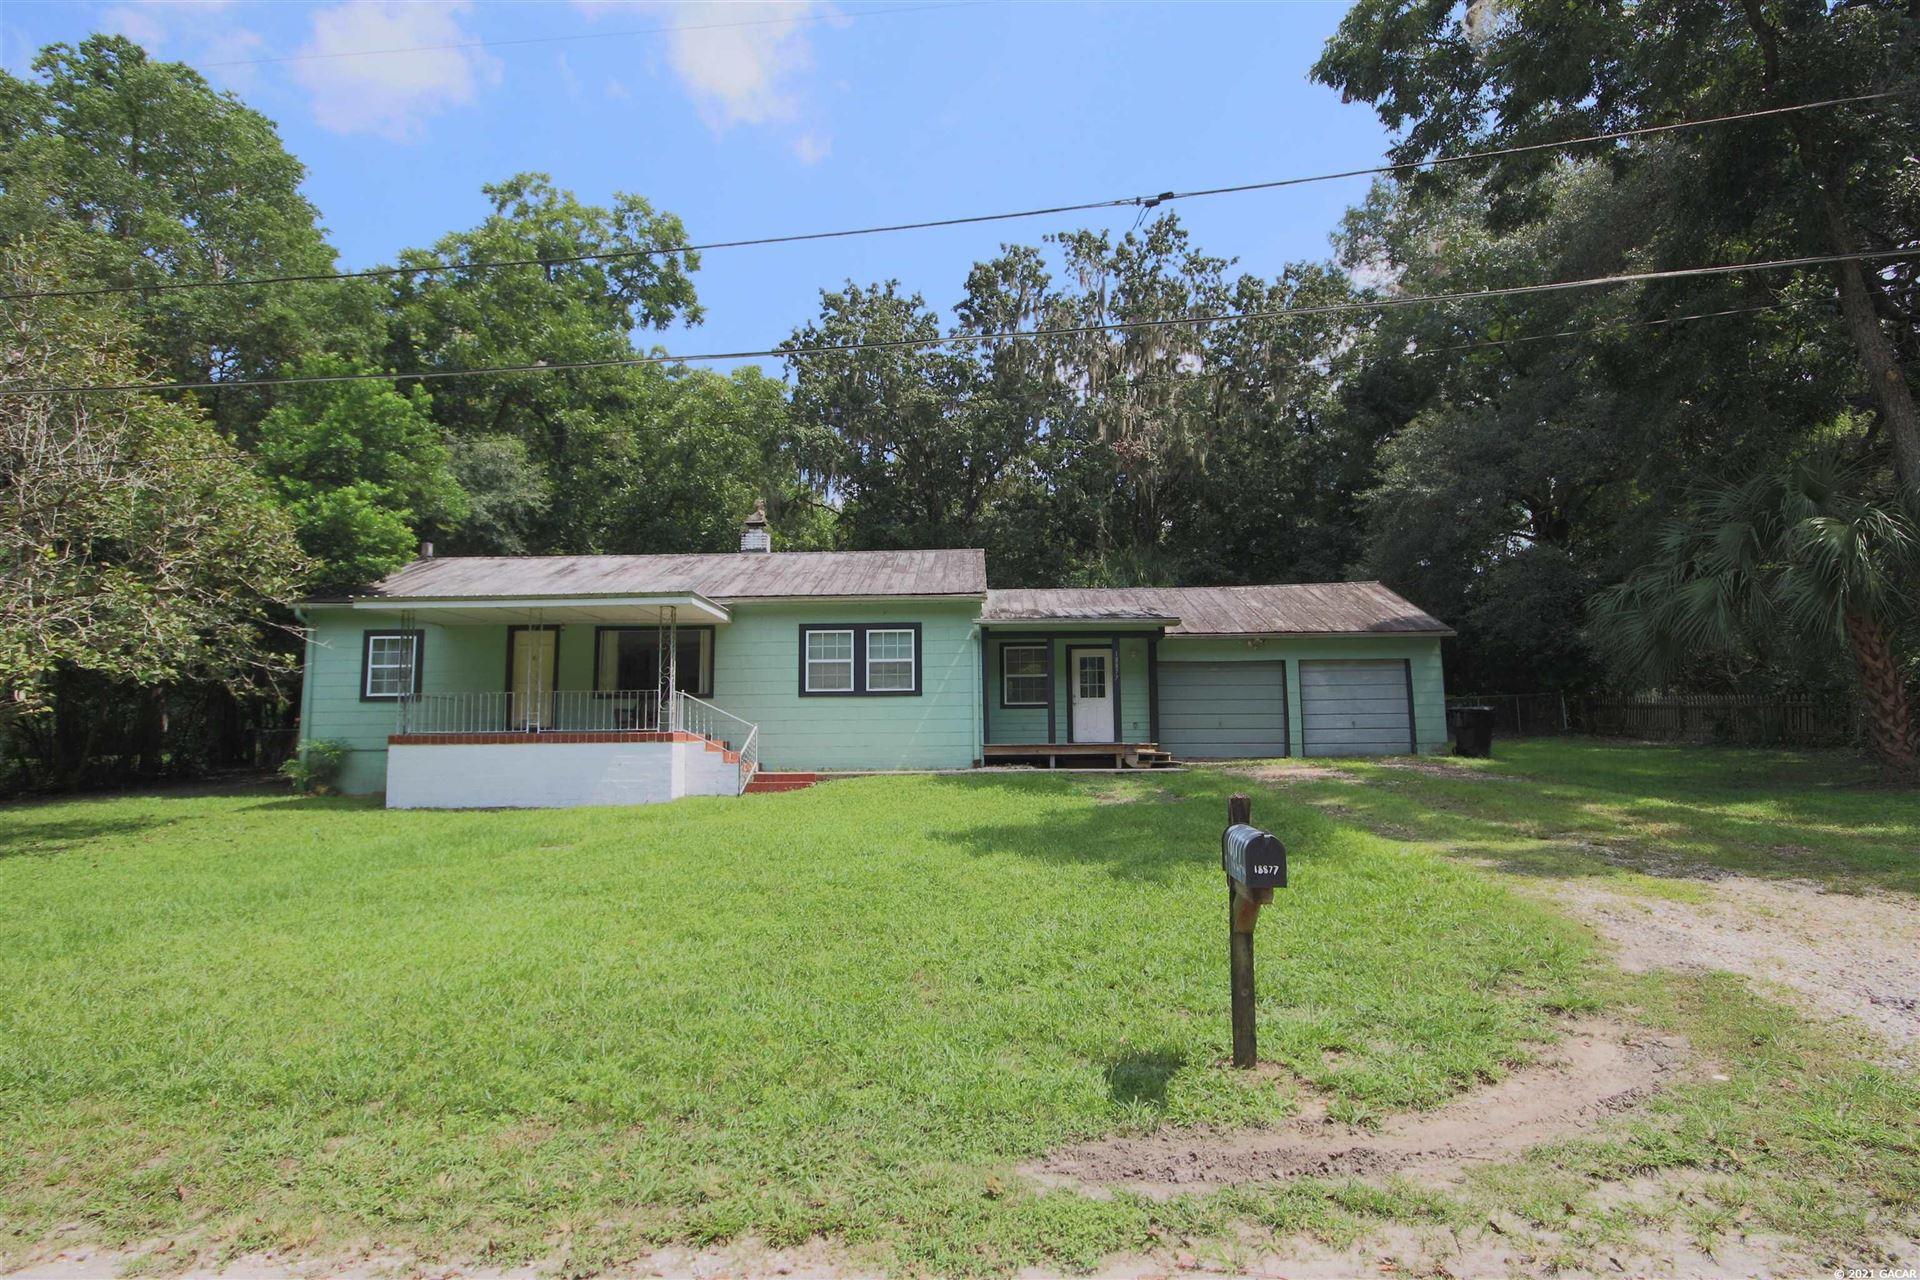 18877 NW 243 Terrace, High Springs, FL 32643 - #: 447857